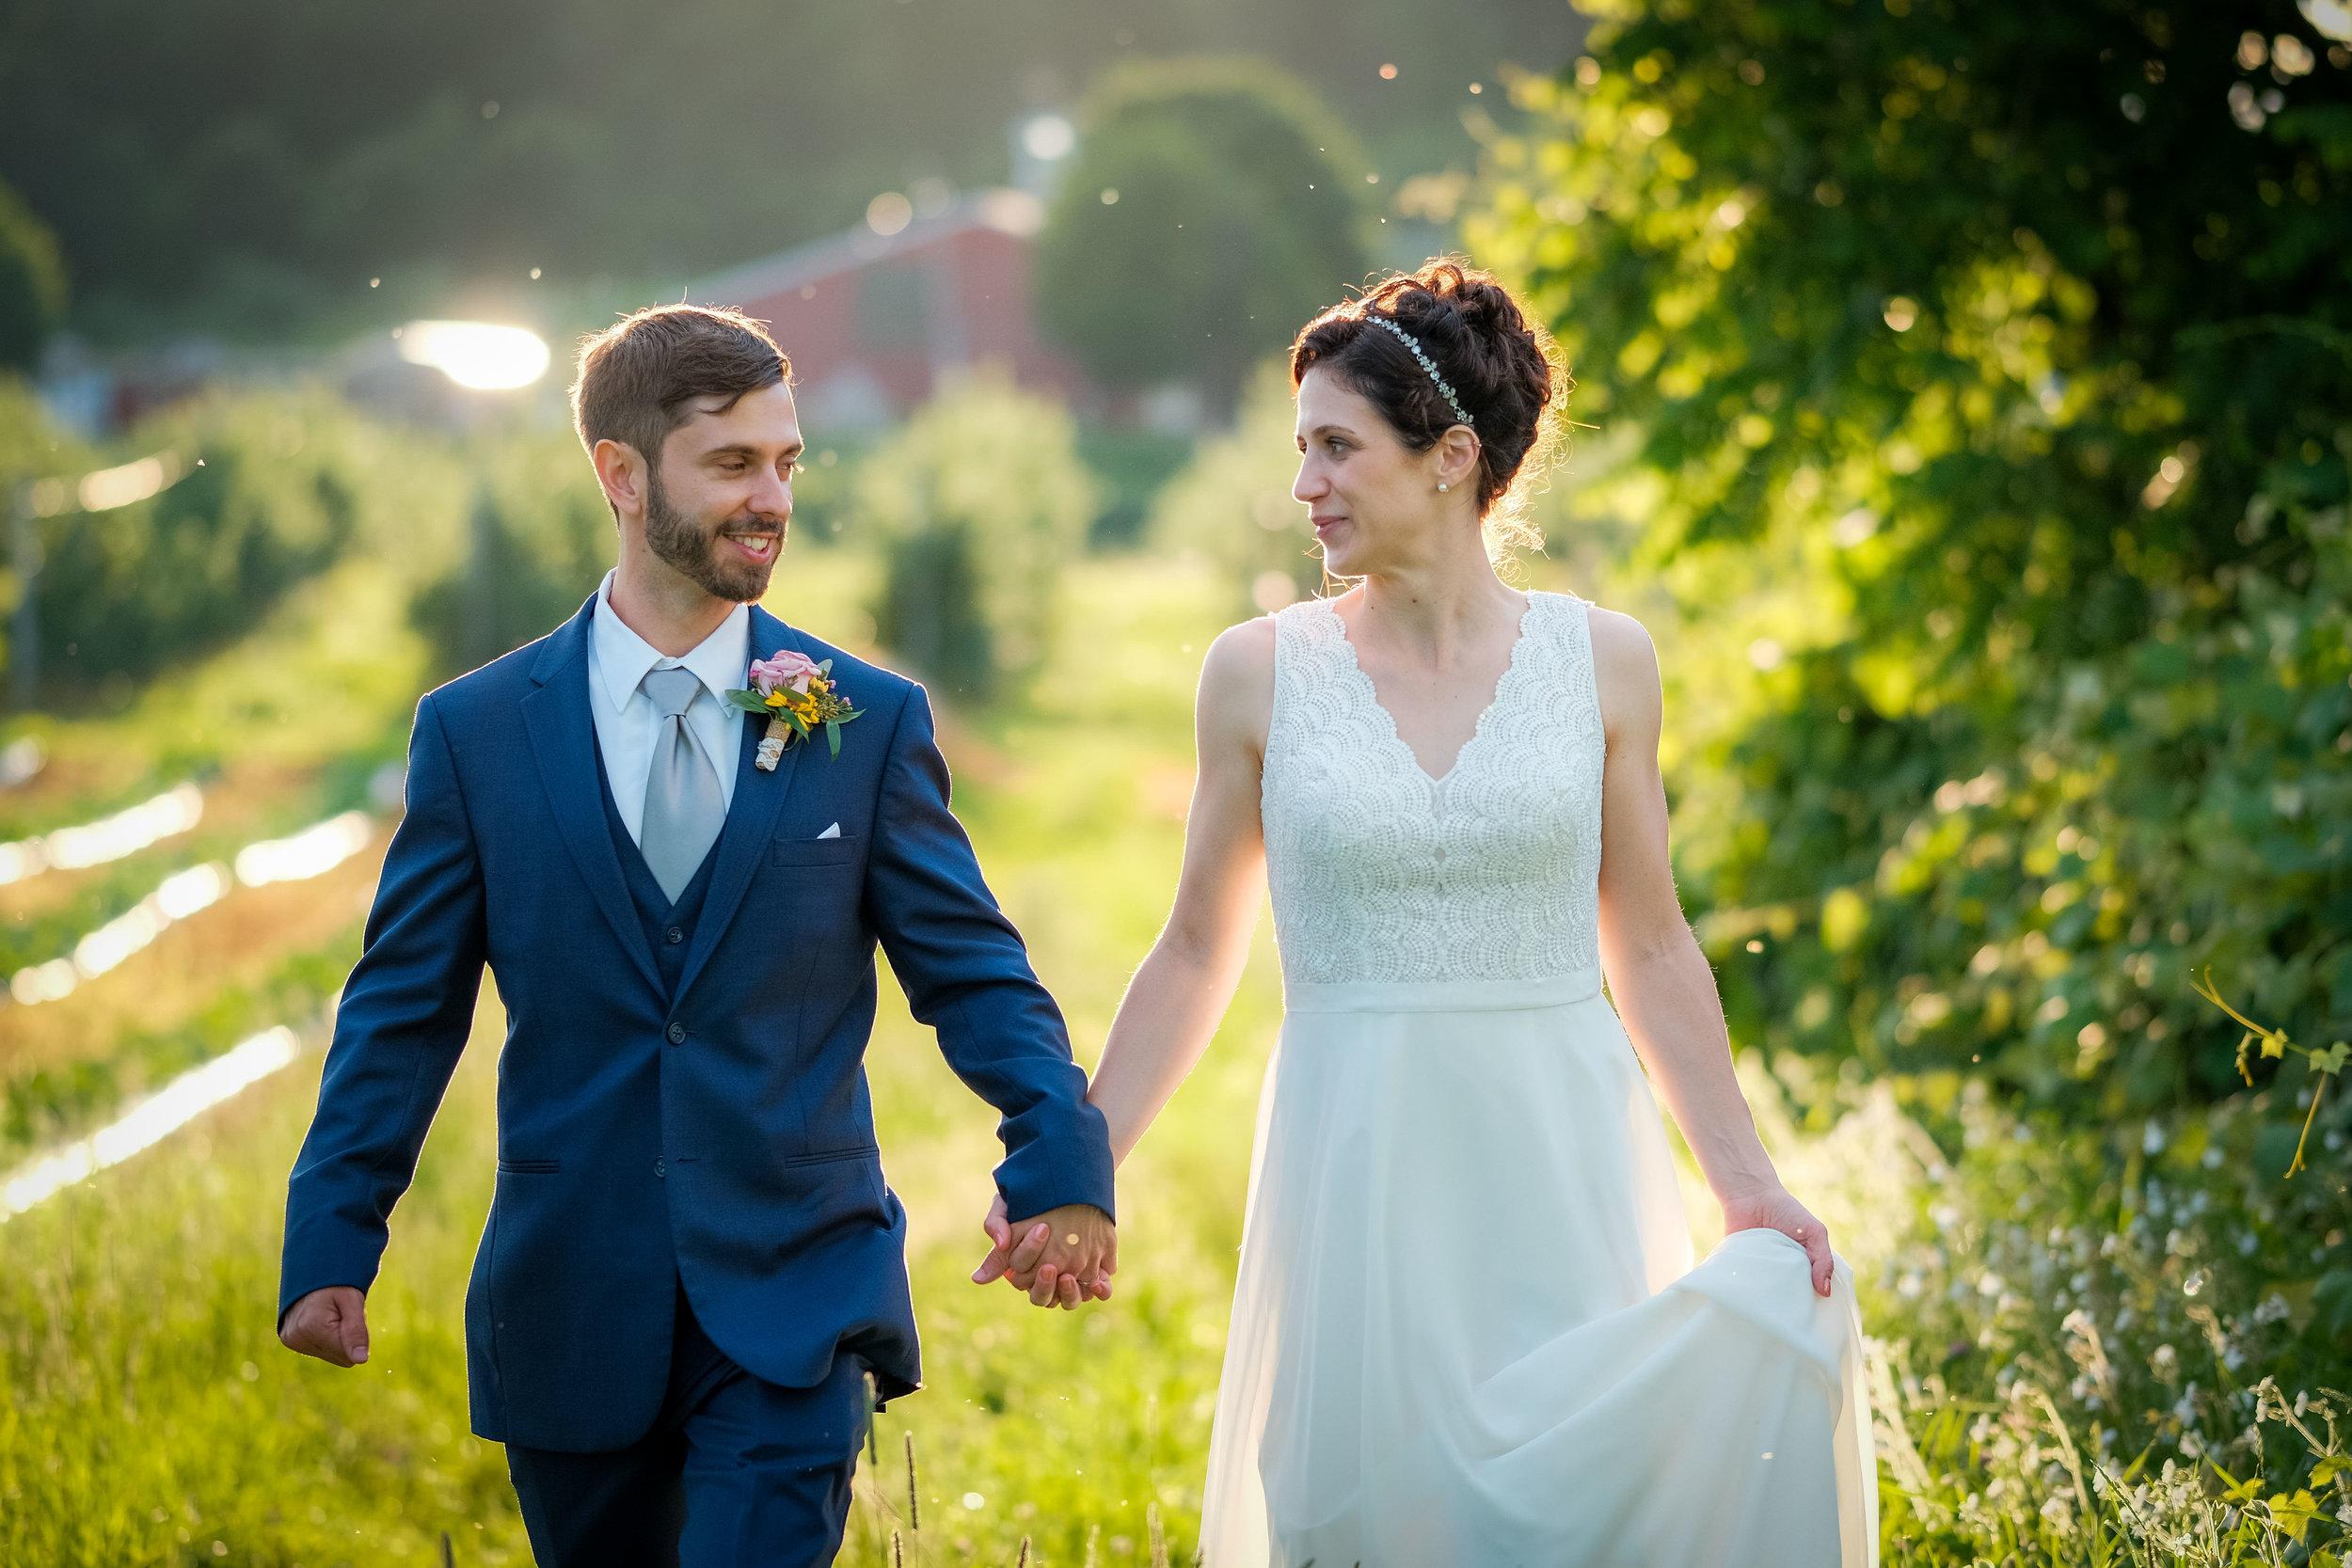 Peabody-Smith-Barn-Wedding-Photography-66.jpg